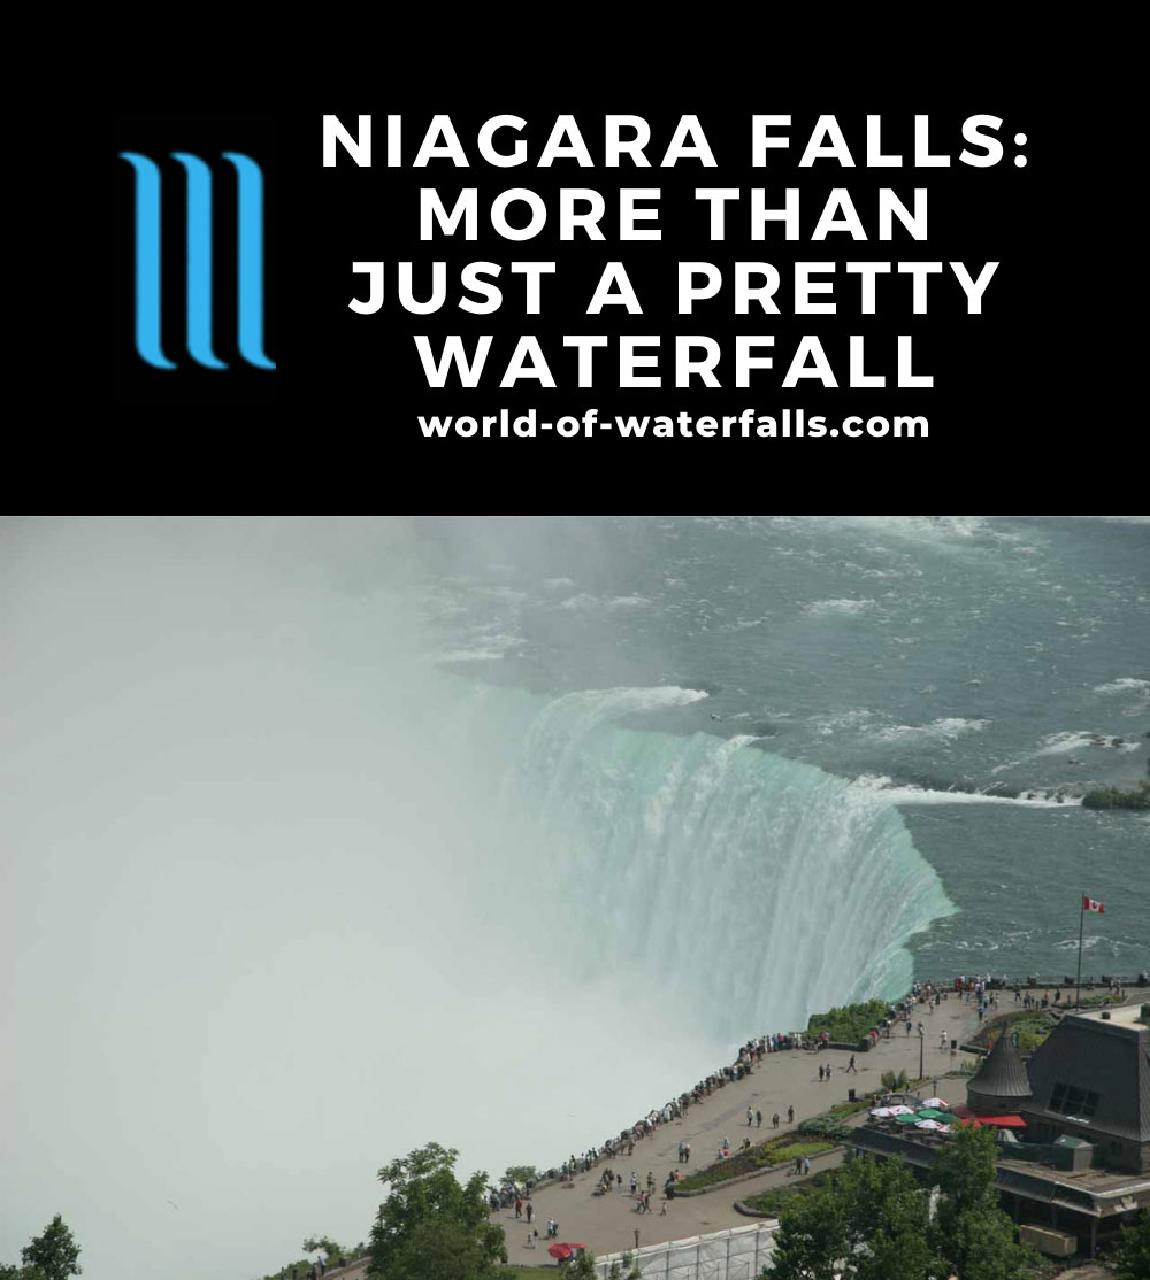 Niagara Falls: More Than Just A Pretty Waterfall